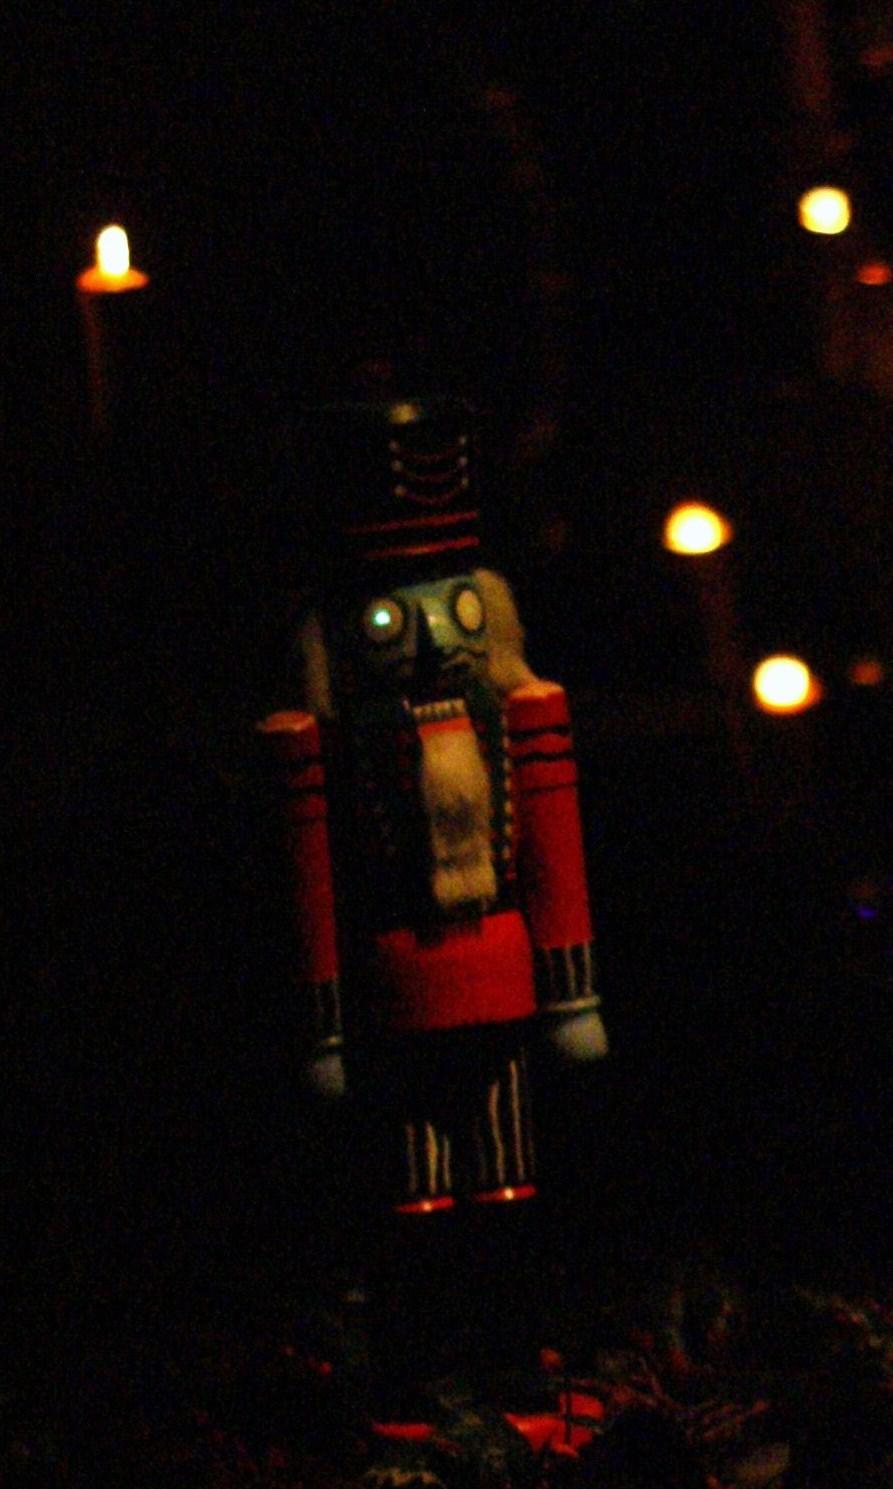 nightmare before christmas overlay - Nightmare Before Christmas Nutcracker